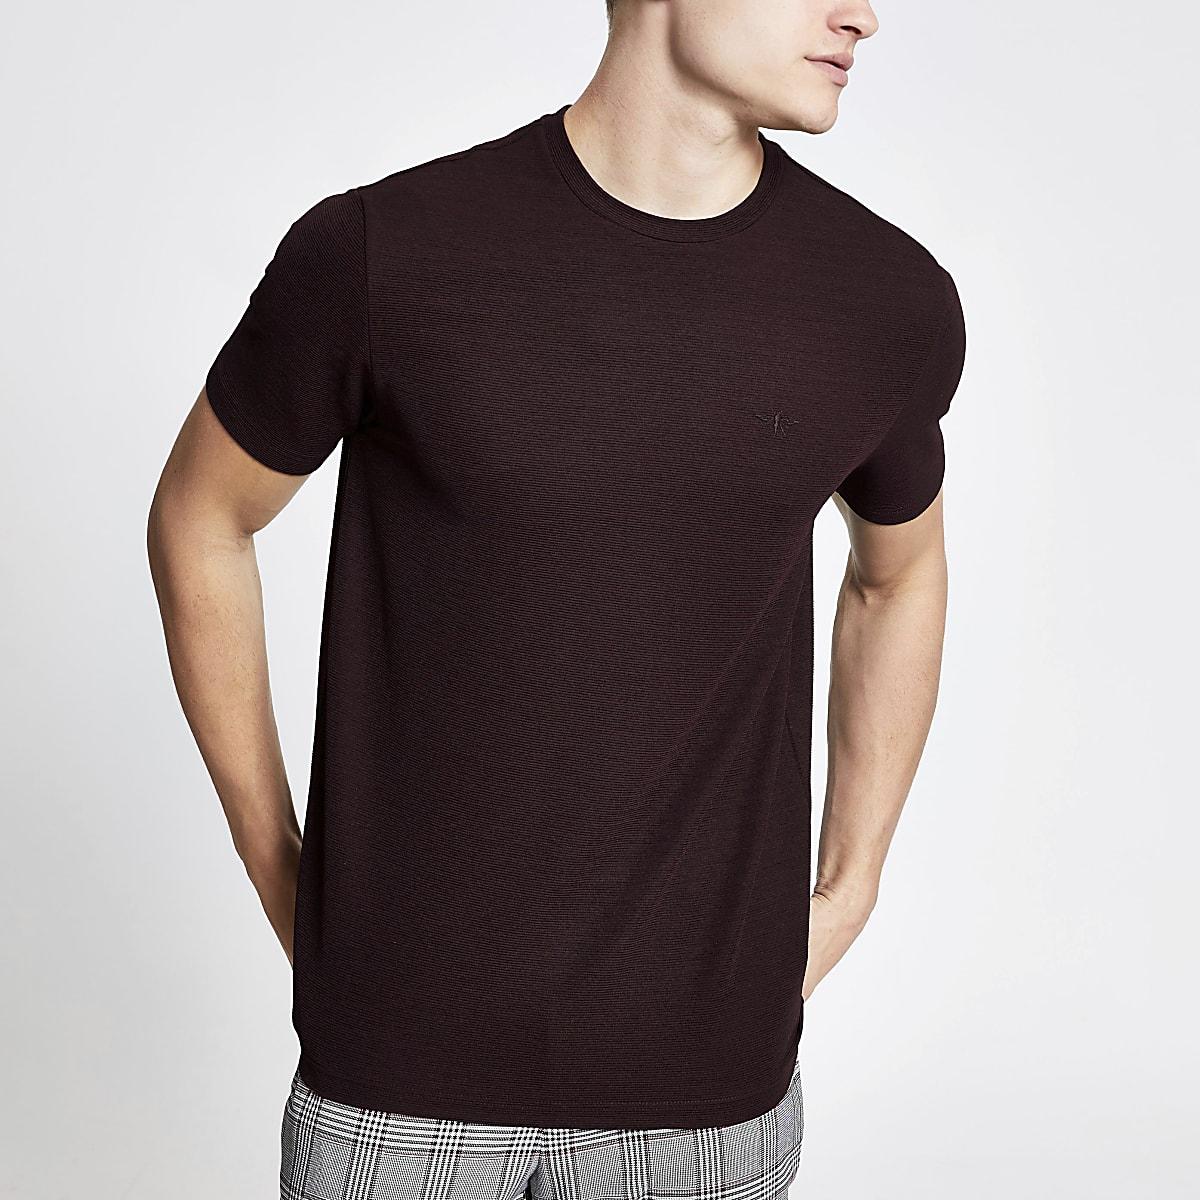 Donkerrood geribbeld aansluitend T-shirt